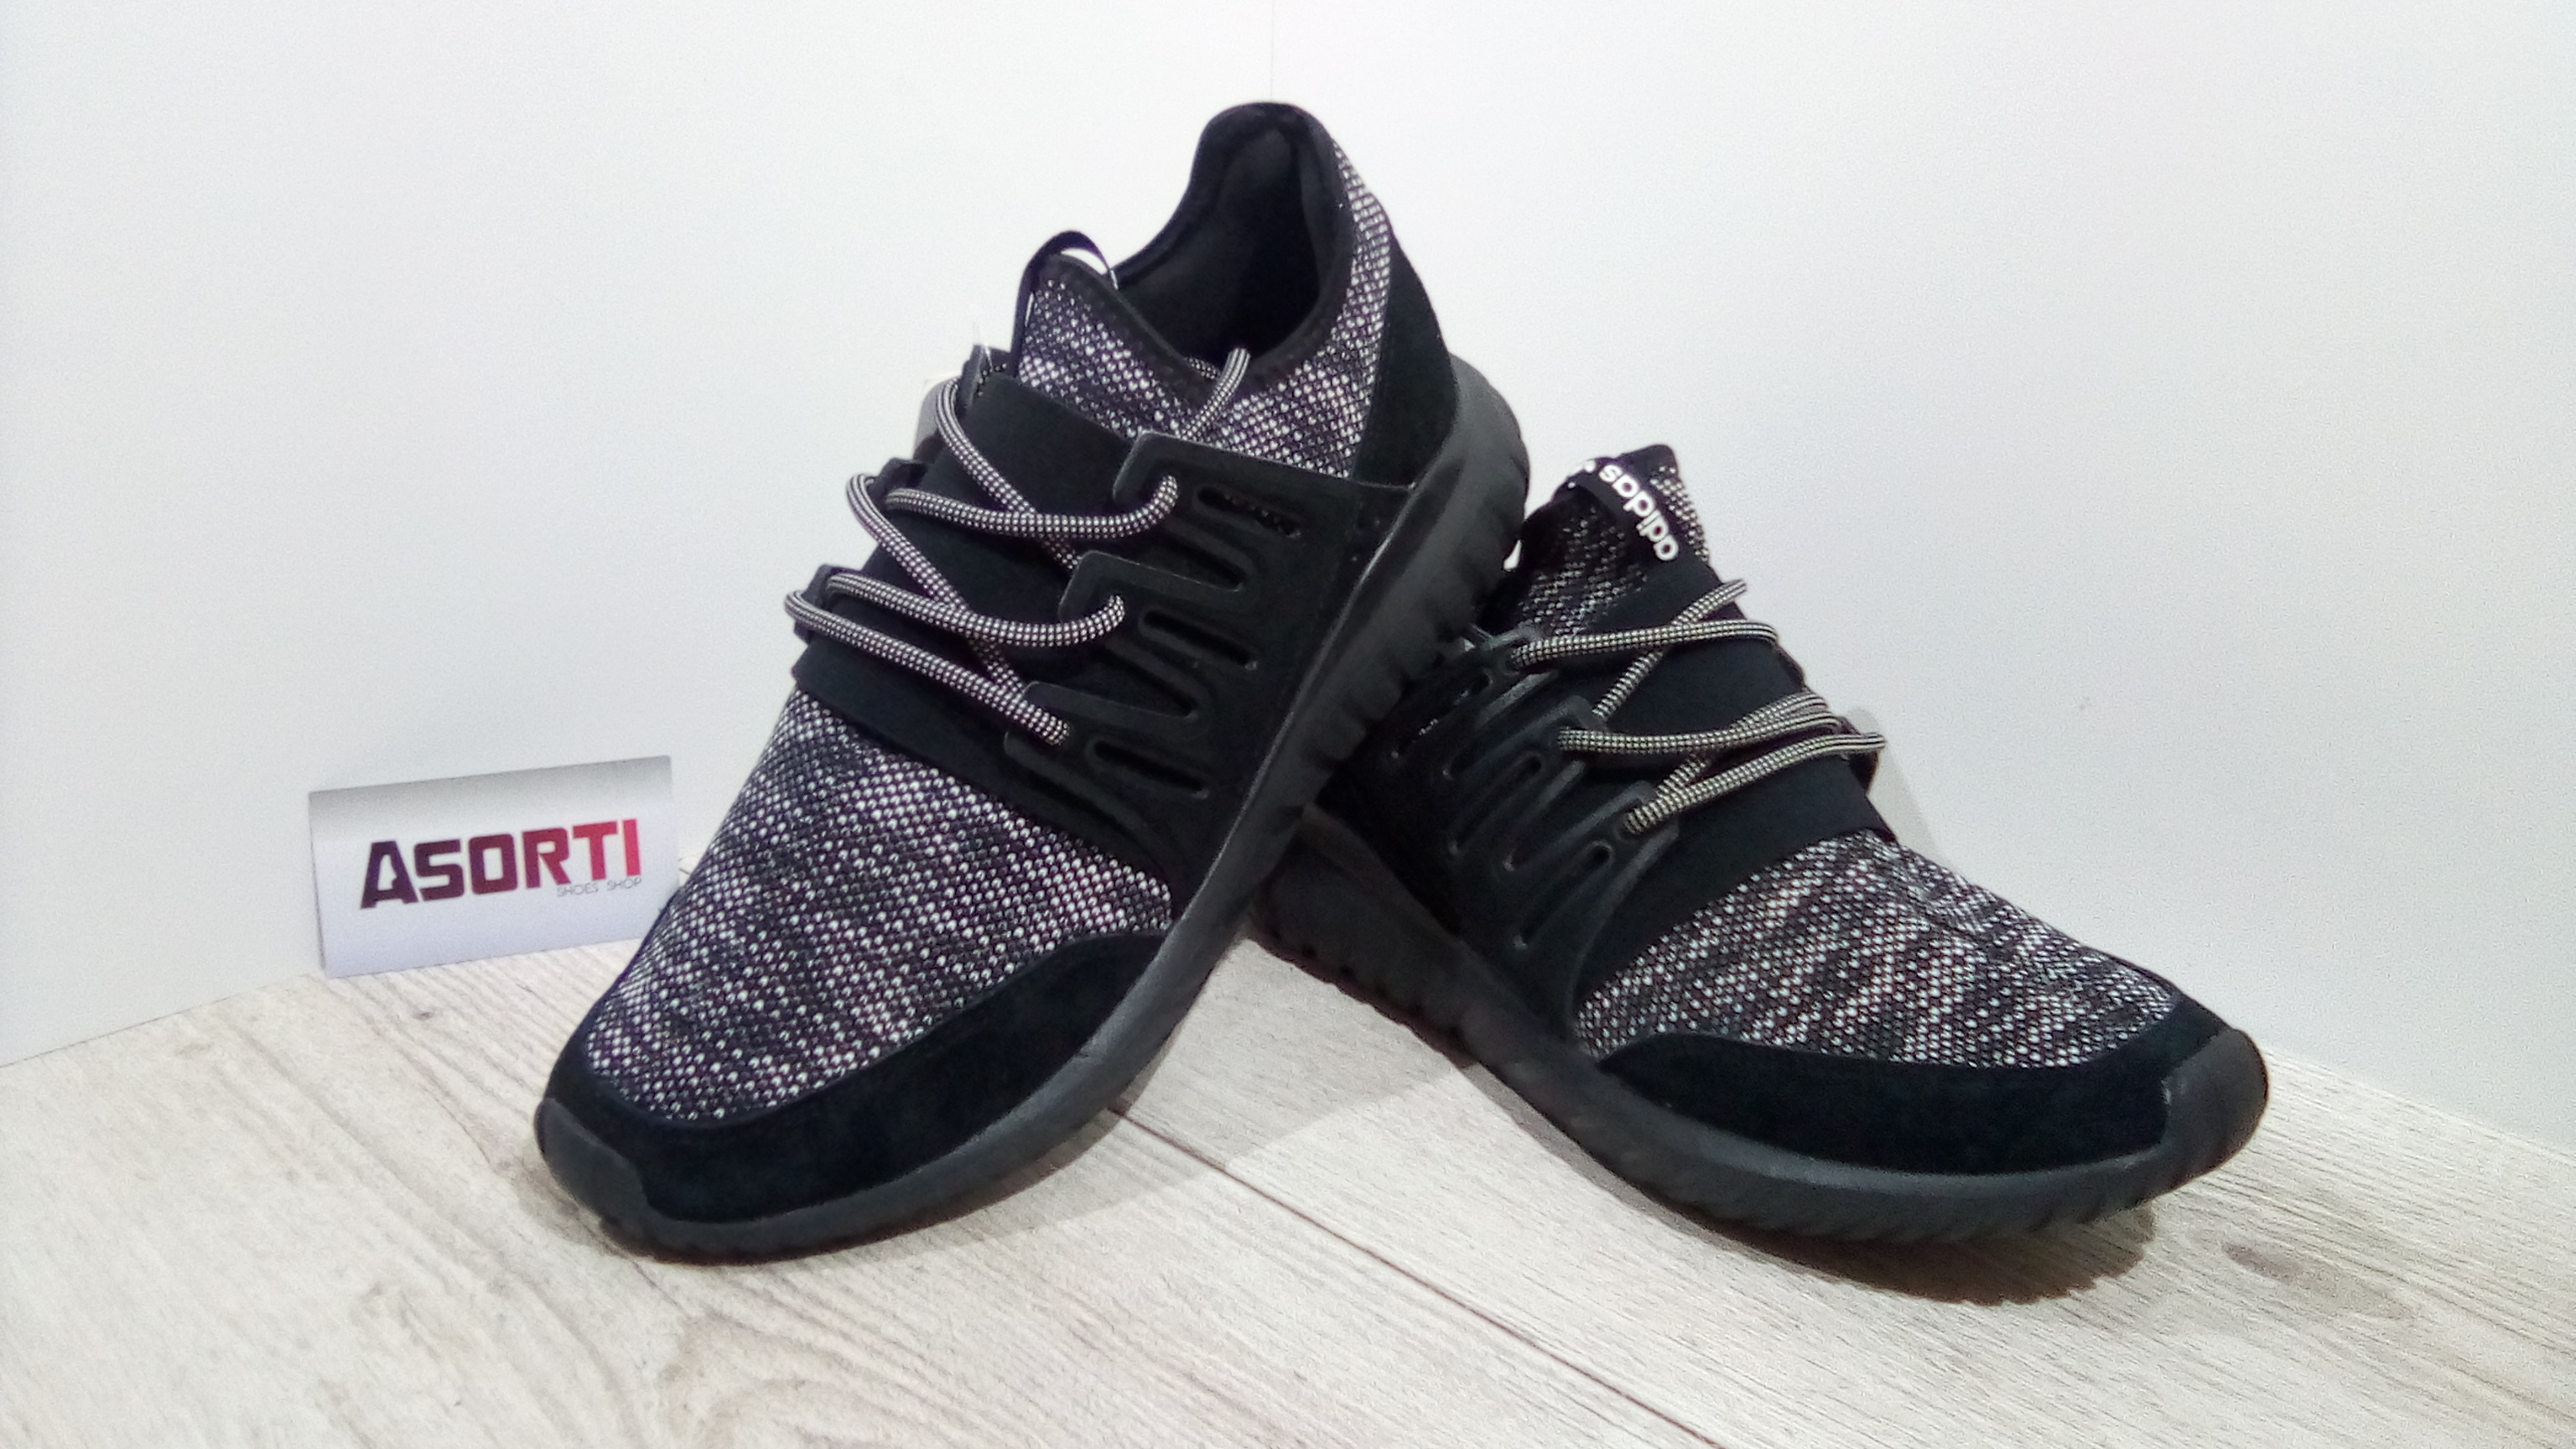 sneakers for cheap 900e1 374ab Мужские кроссовки Adidas Originals Tubular Radial (BB2394) черные